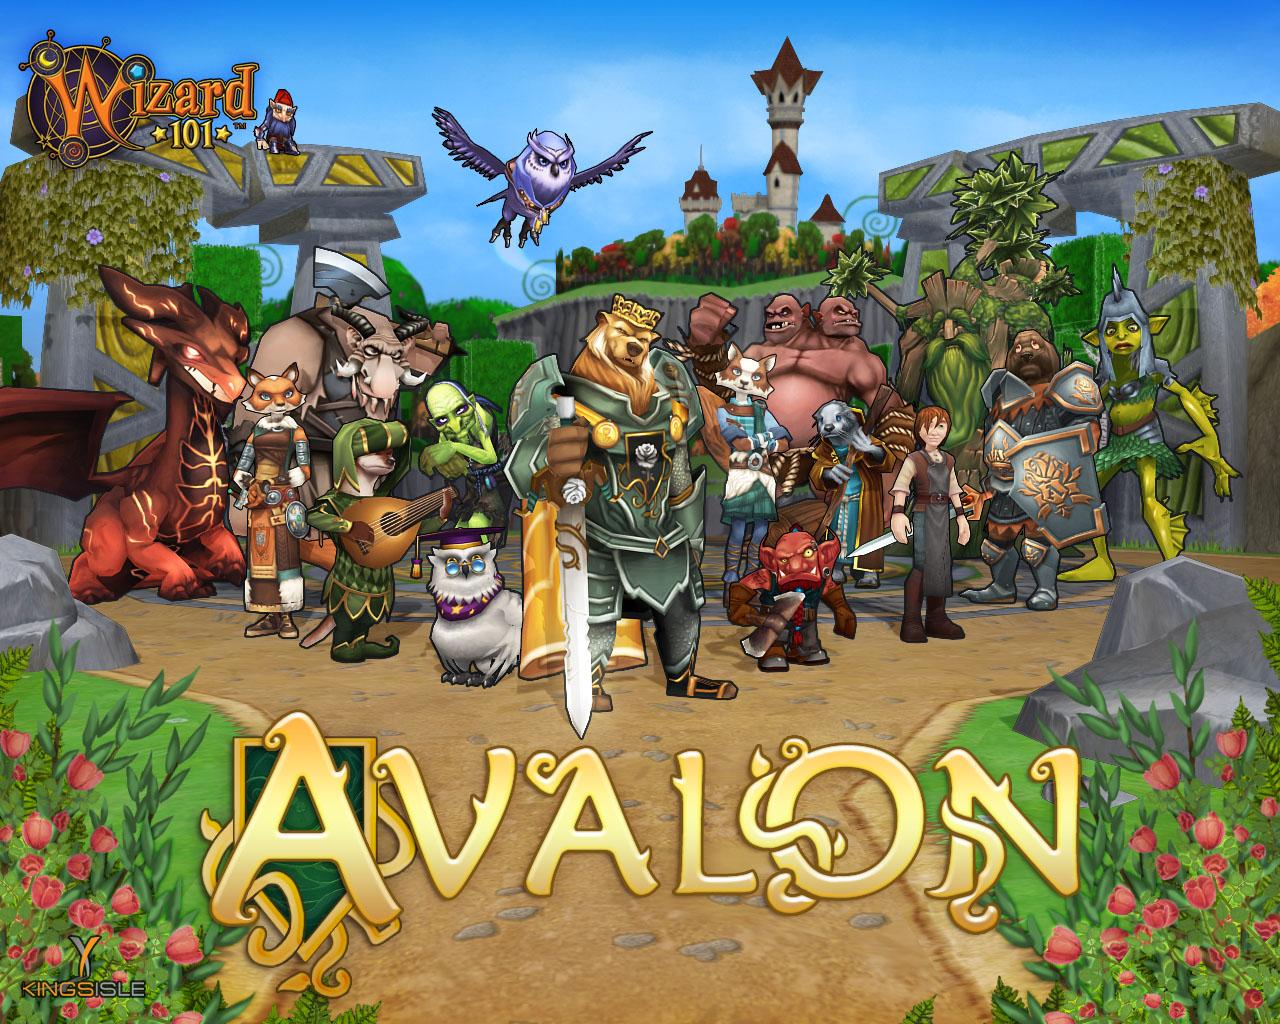 http://1.bp.blogspot.com/-R3BFj4H49ho/T4MIhB9B4HI/AAAAAAAAPbw/AZBy6jrnxtc/s1600/AvalonWallpaper.jpg